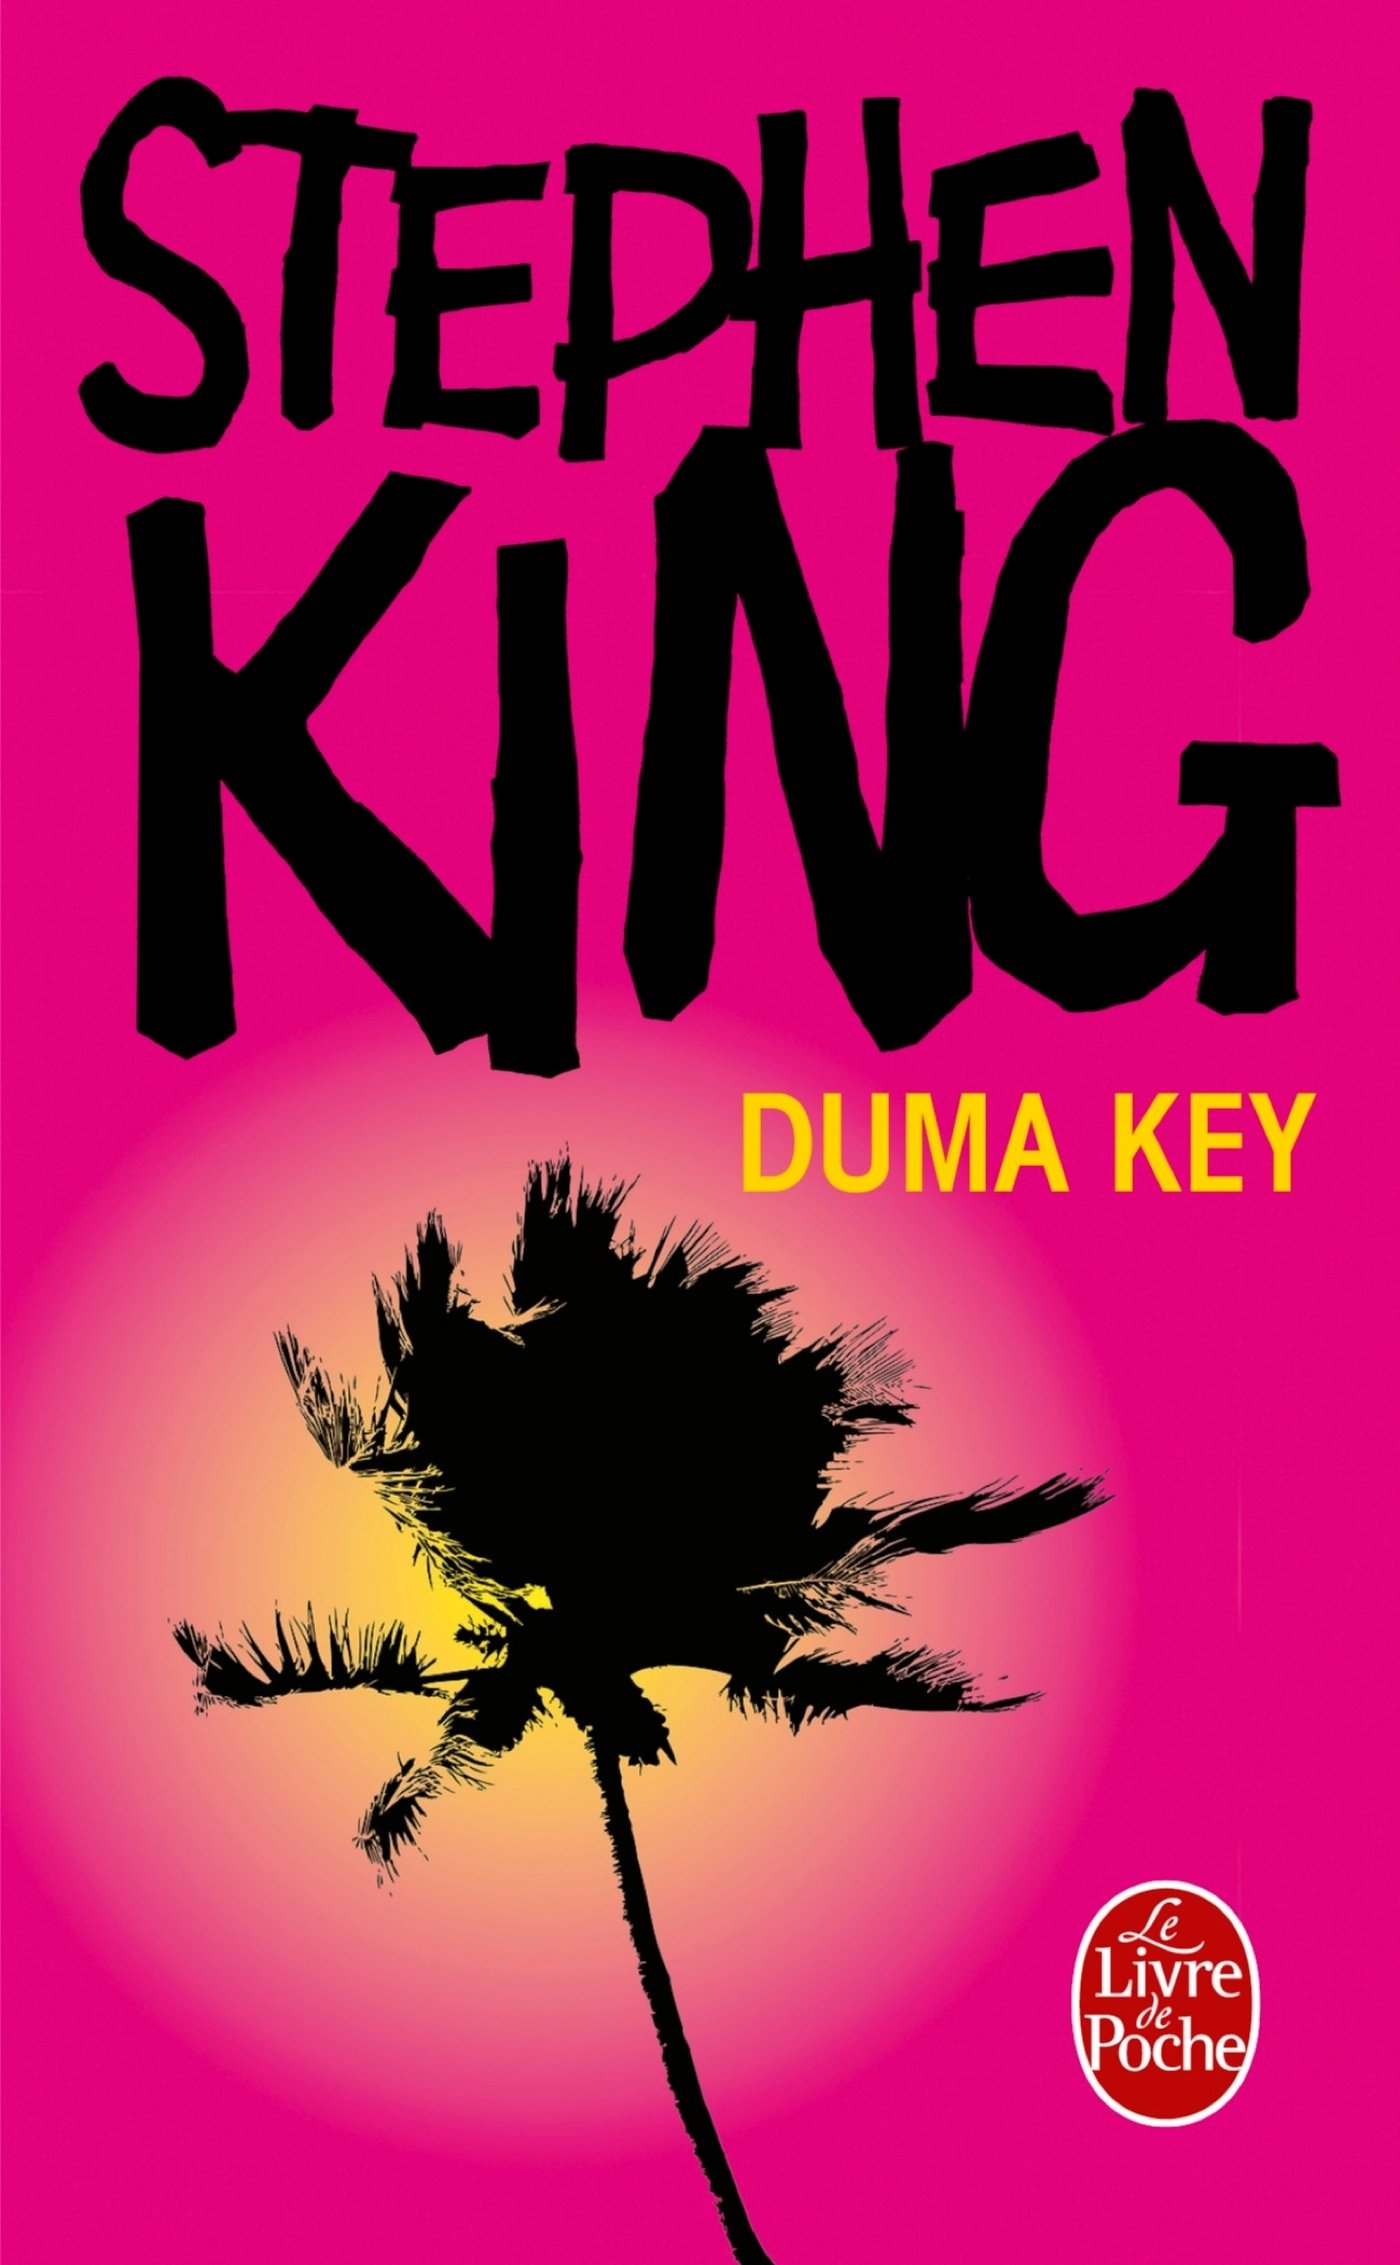 Duma Key - couverture